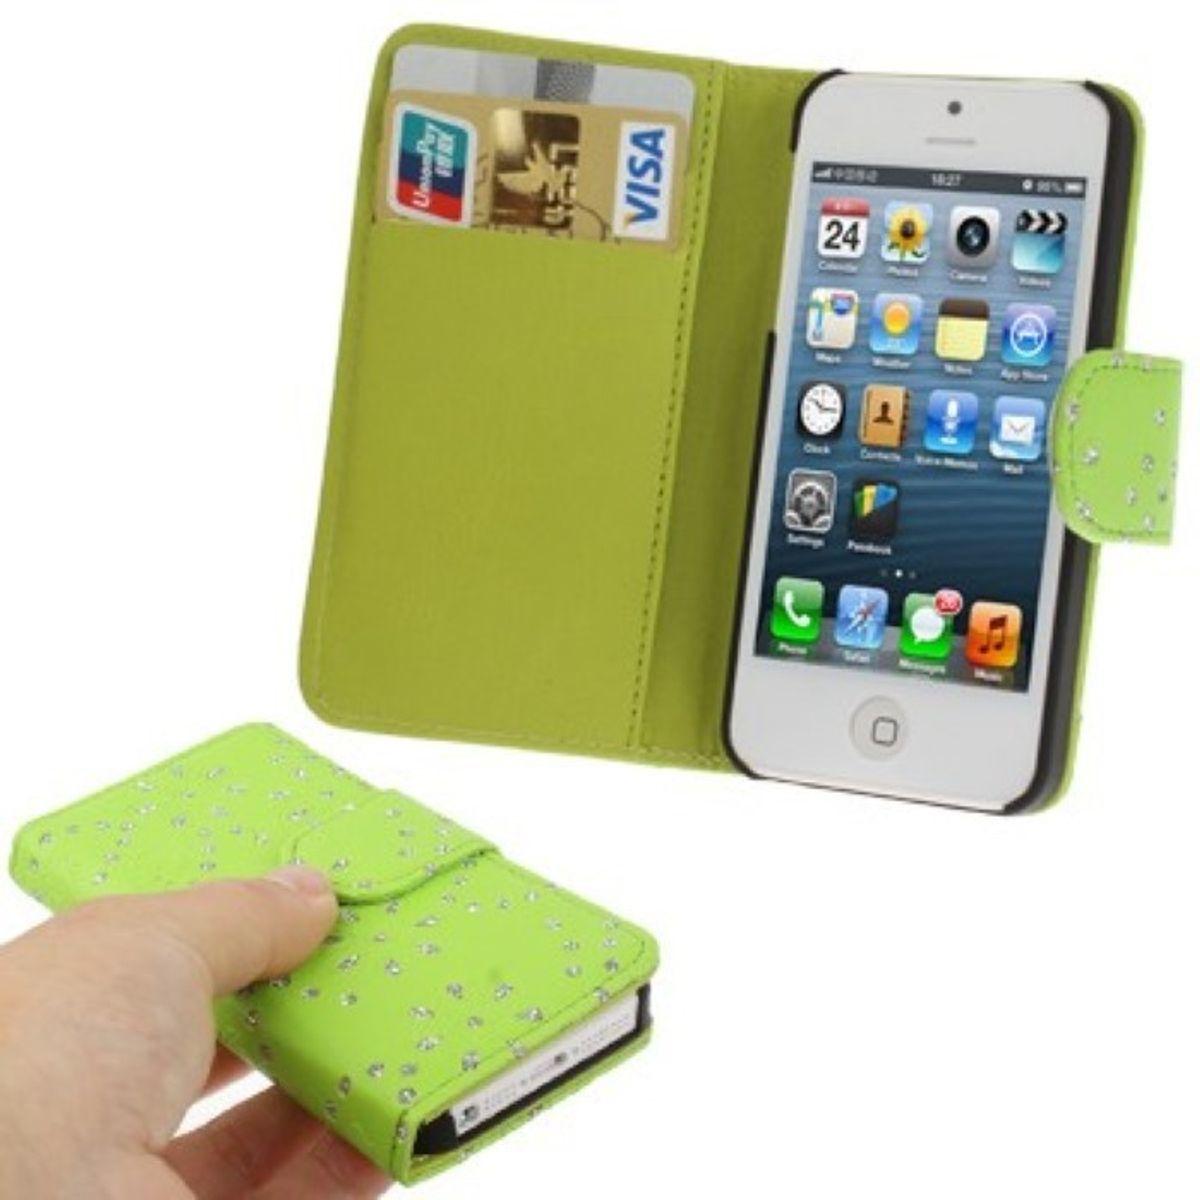 schutzh lle flip quer f r handy apple iphone se gr n. Black Bedroom Furniture Sets. Home Design Ideas